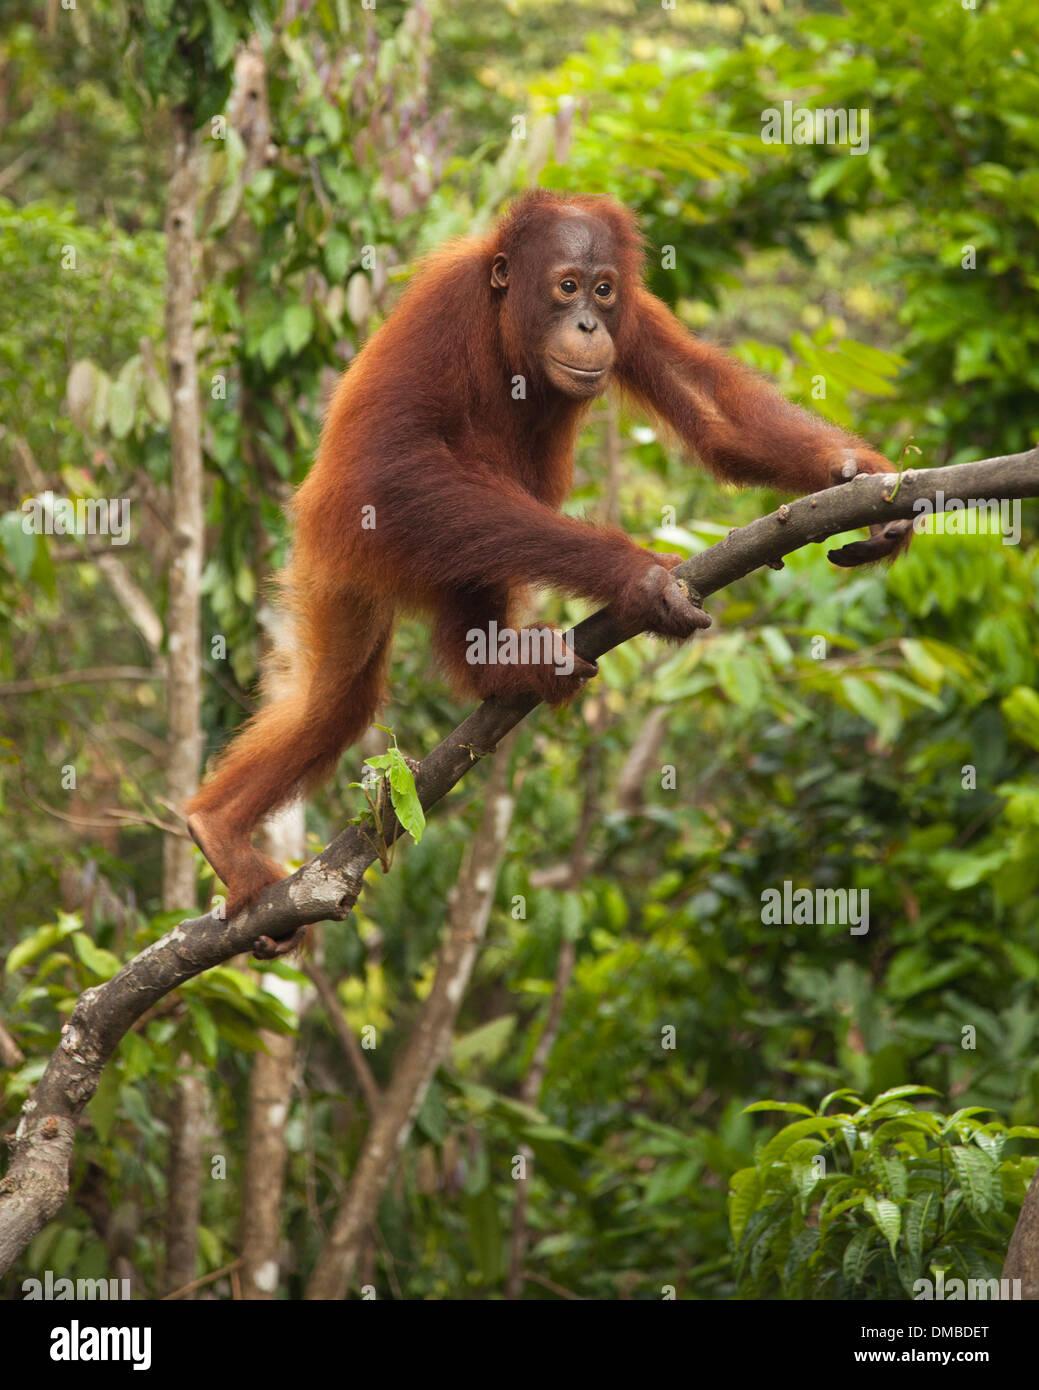 Young wild Orangutan (Pongo pygmaeus) climbing tree at Camp Leakey - Stock Image